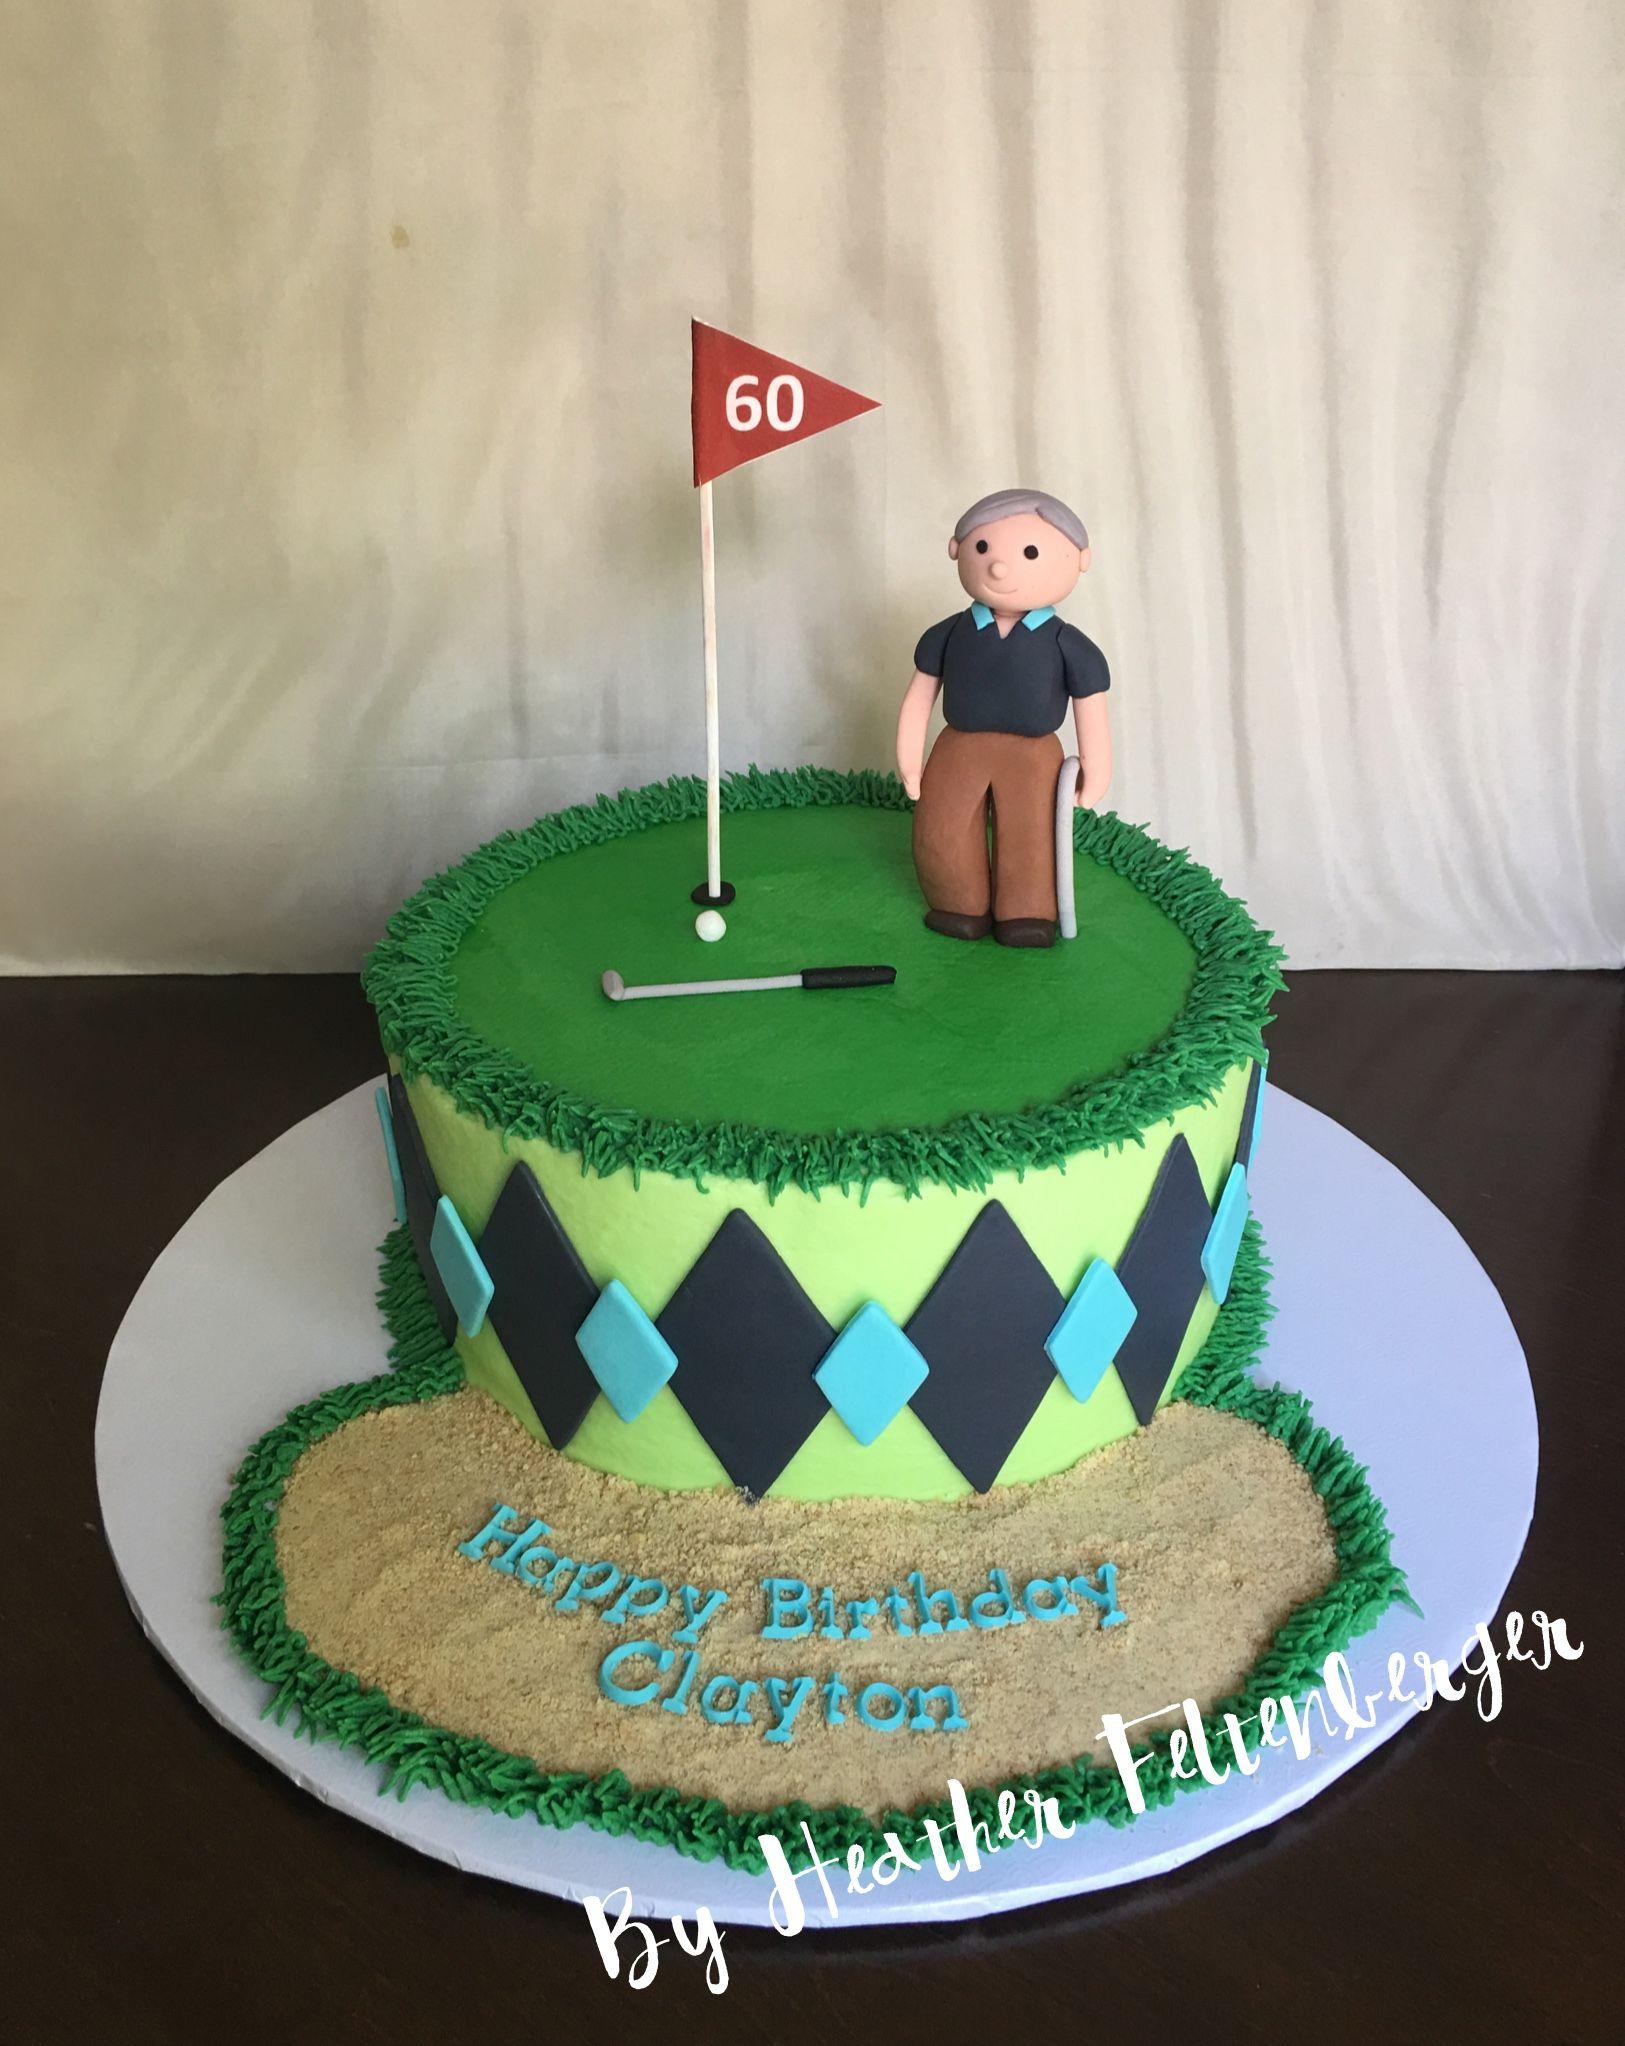 Old Man Golfing 60th Birthday Cake My Cakes Pinterest 60th